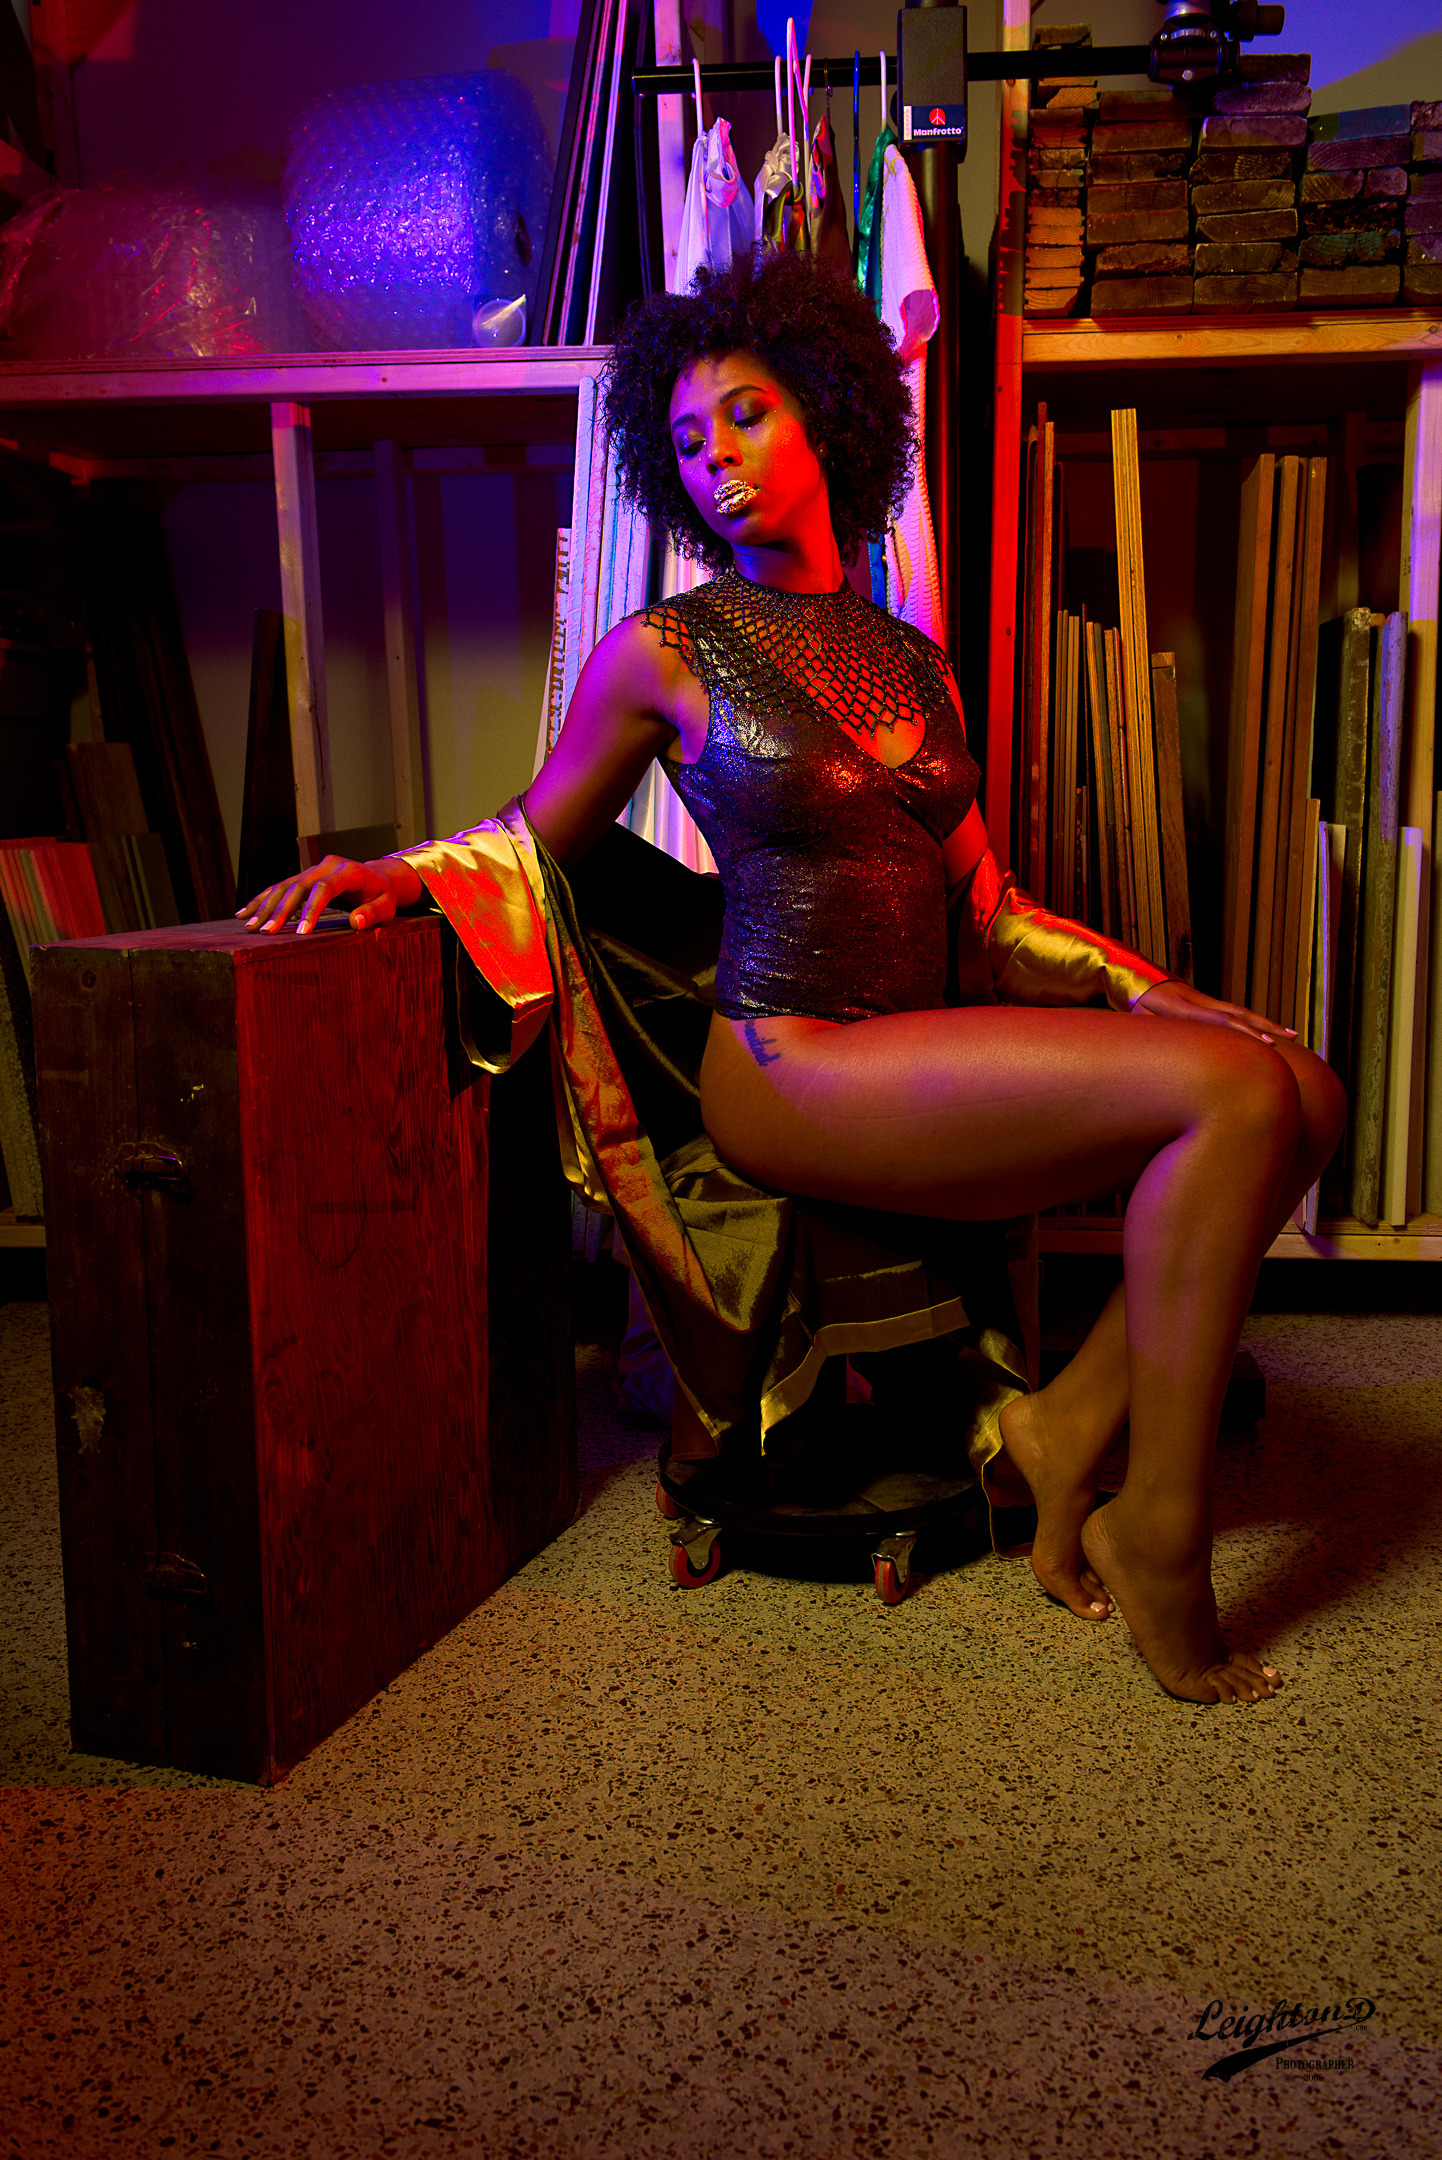 Janiece-LeightonD--2.jpg